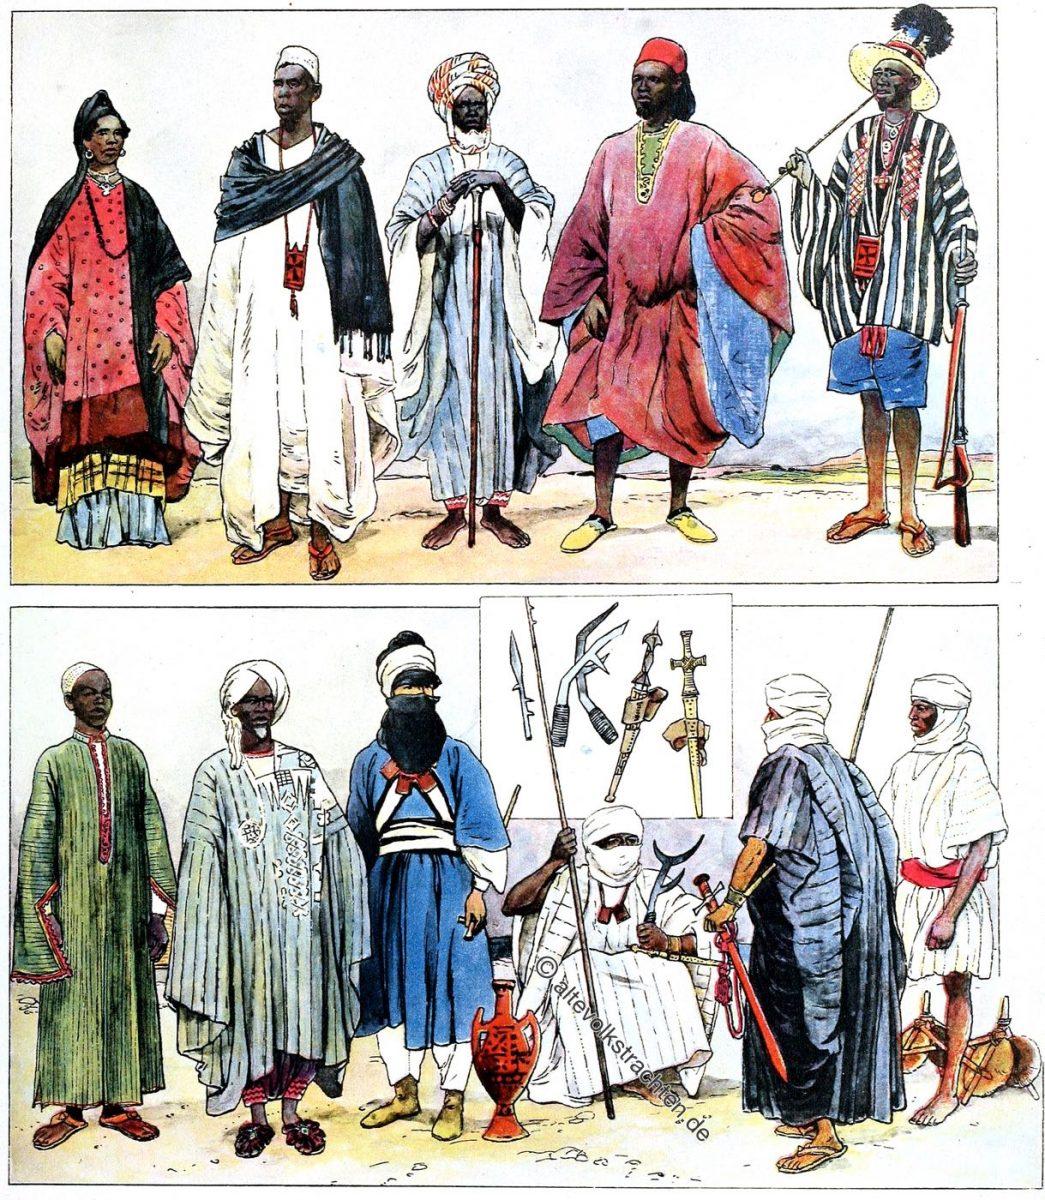 Volkstrachten der Sahara und Sudan. Senegal, Bornu, Tuareg, Tibbu, Fulbe.